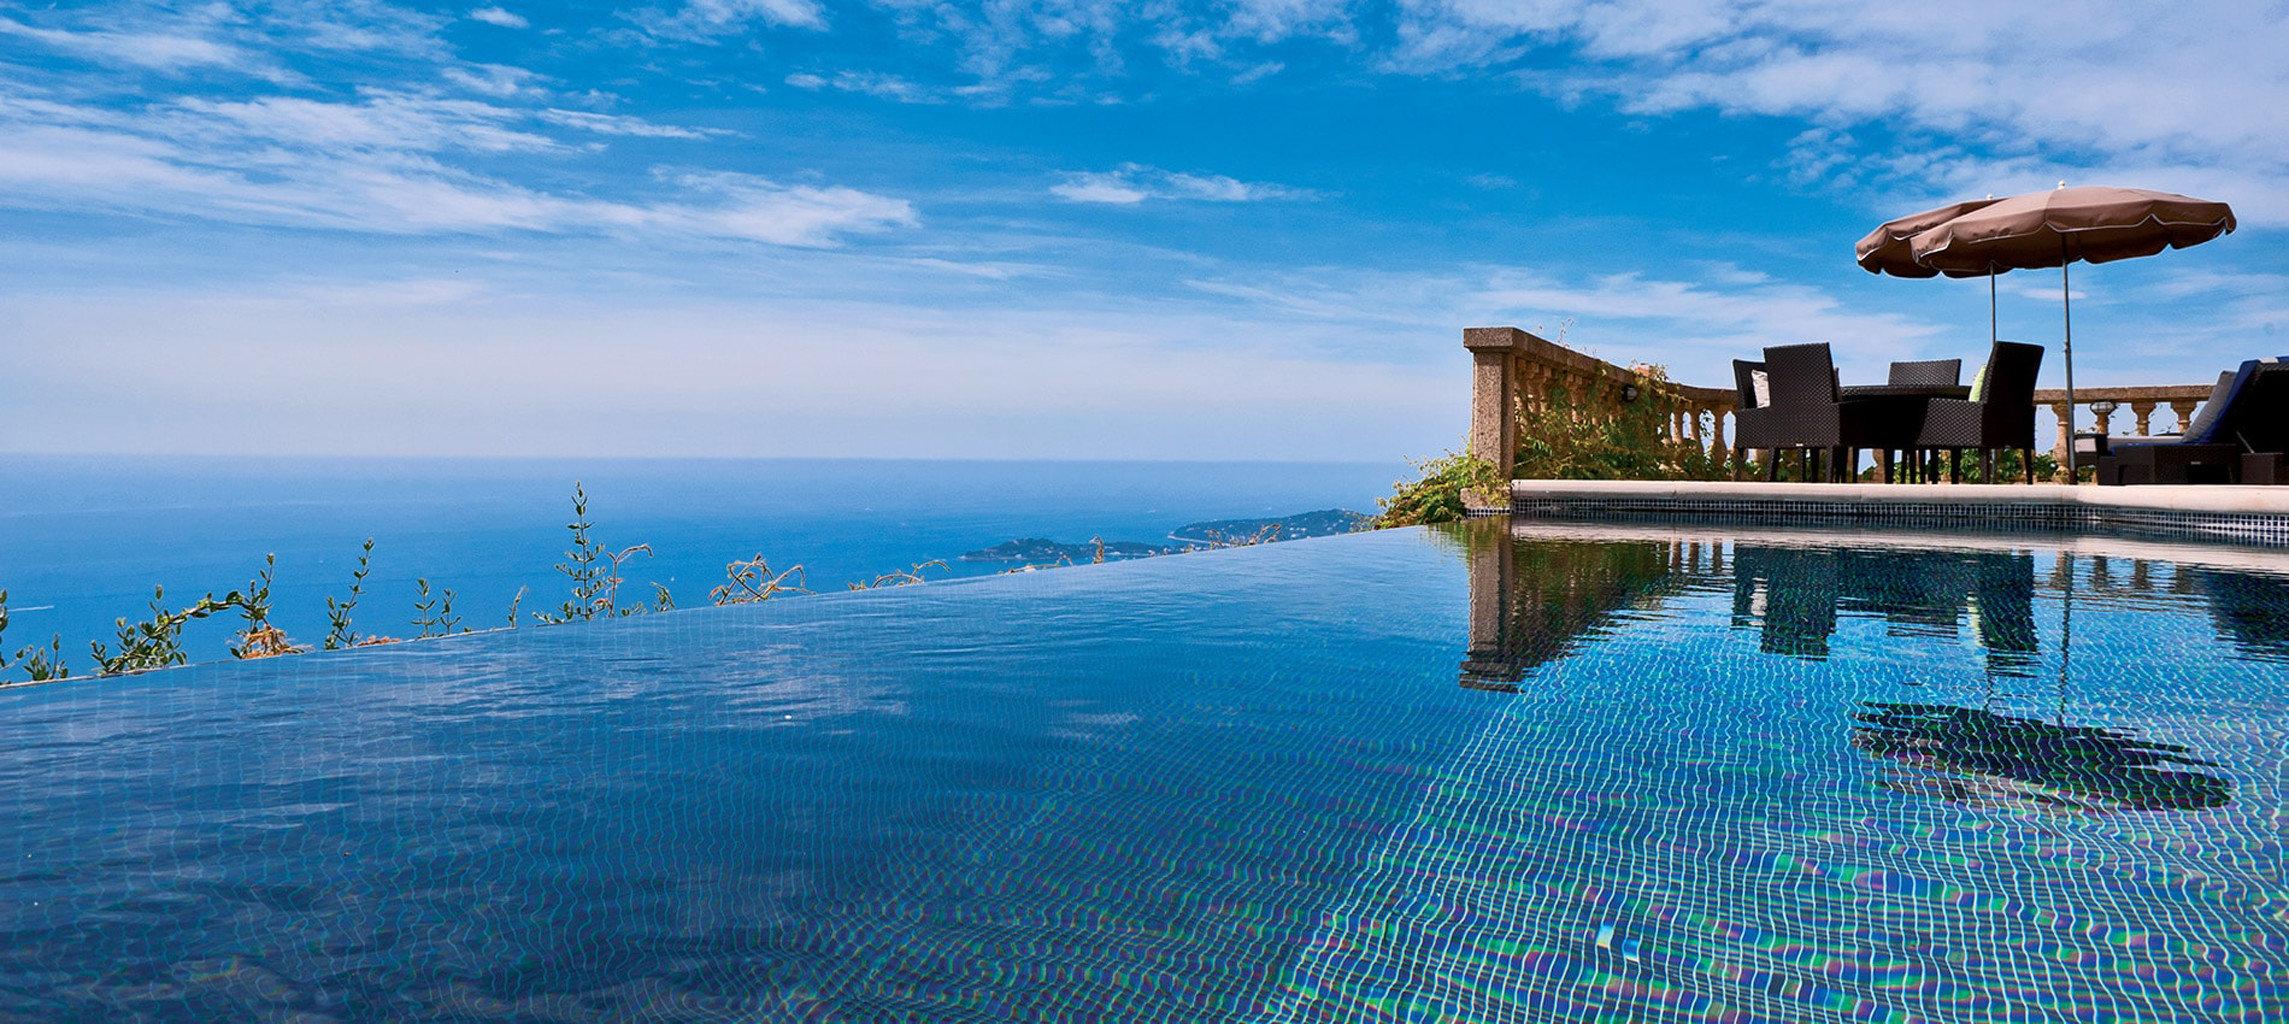 sky water Sea shore Ocean horizon swimming pool Coast Beach blue cape Resort day distance